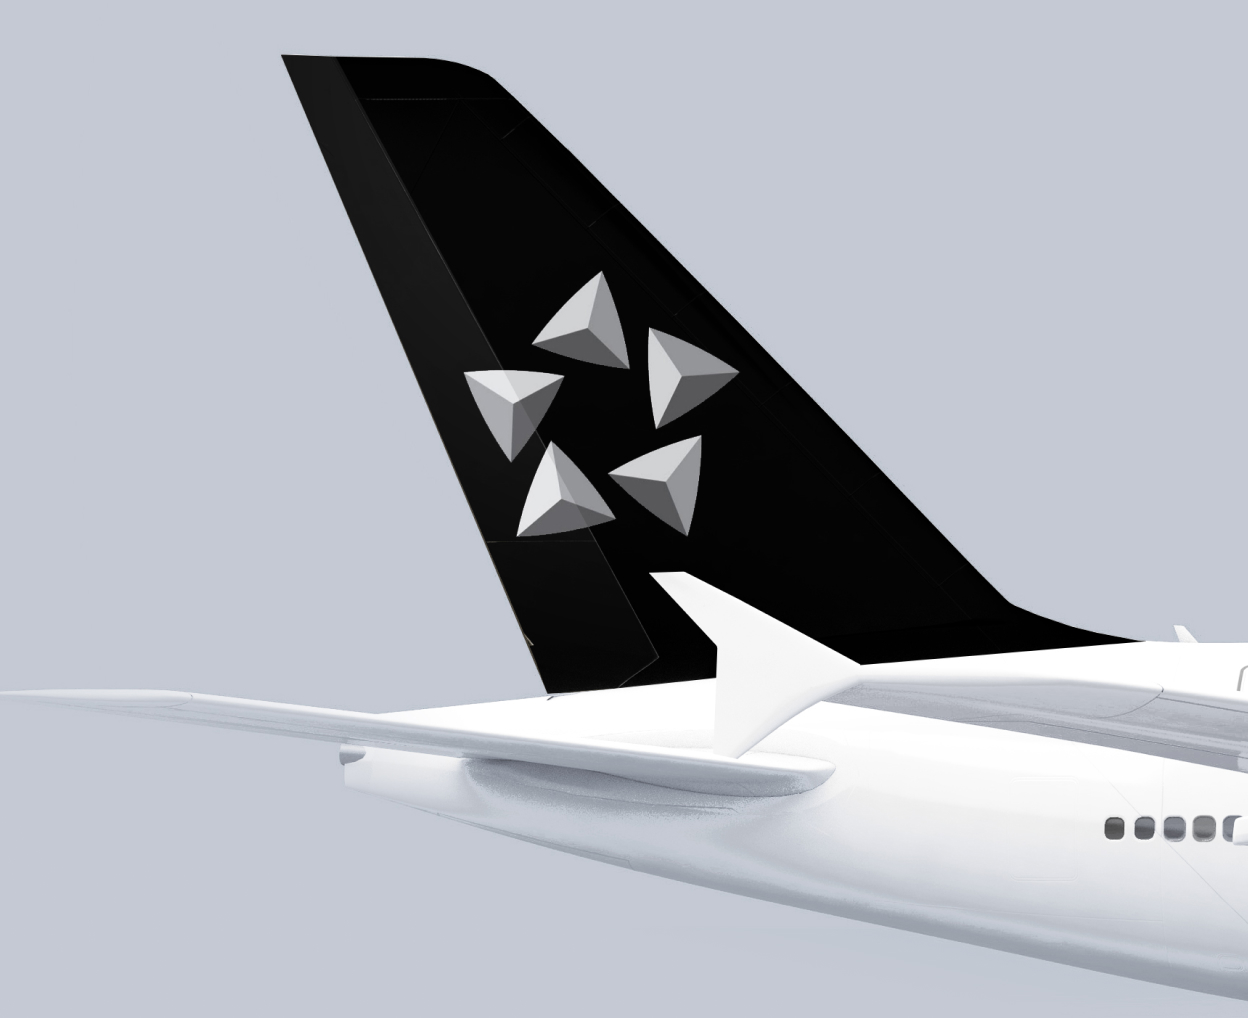 A Unified Flight Network